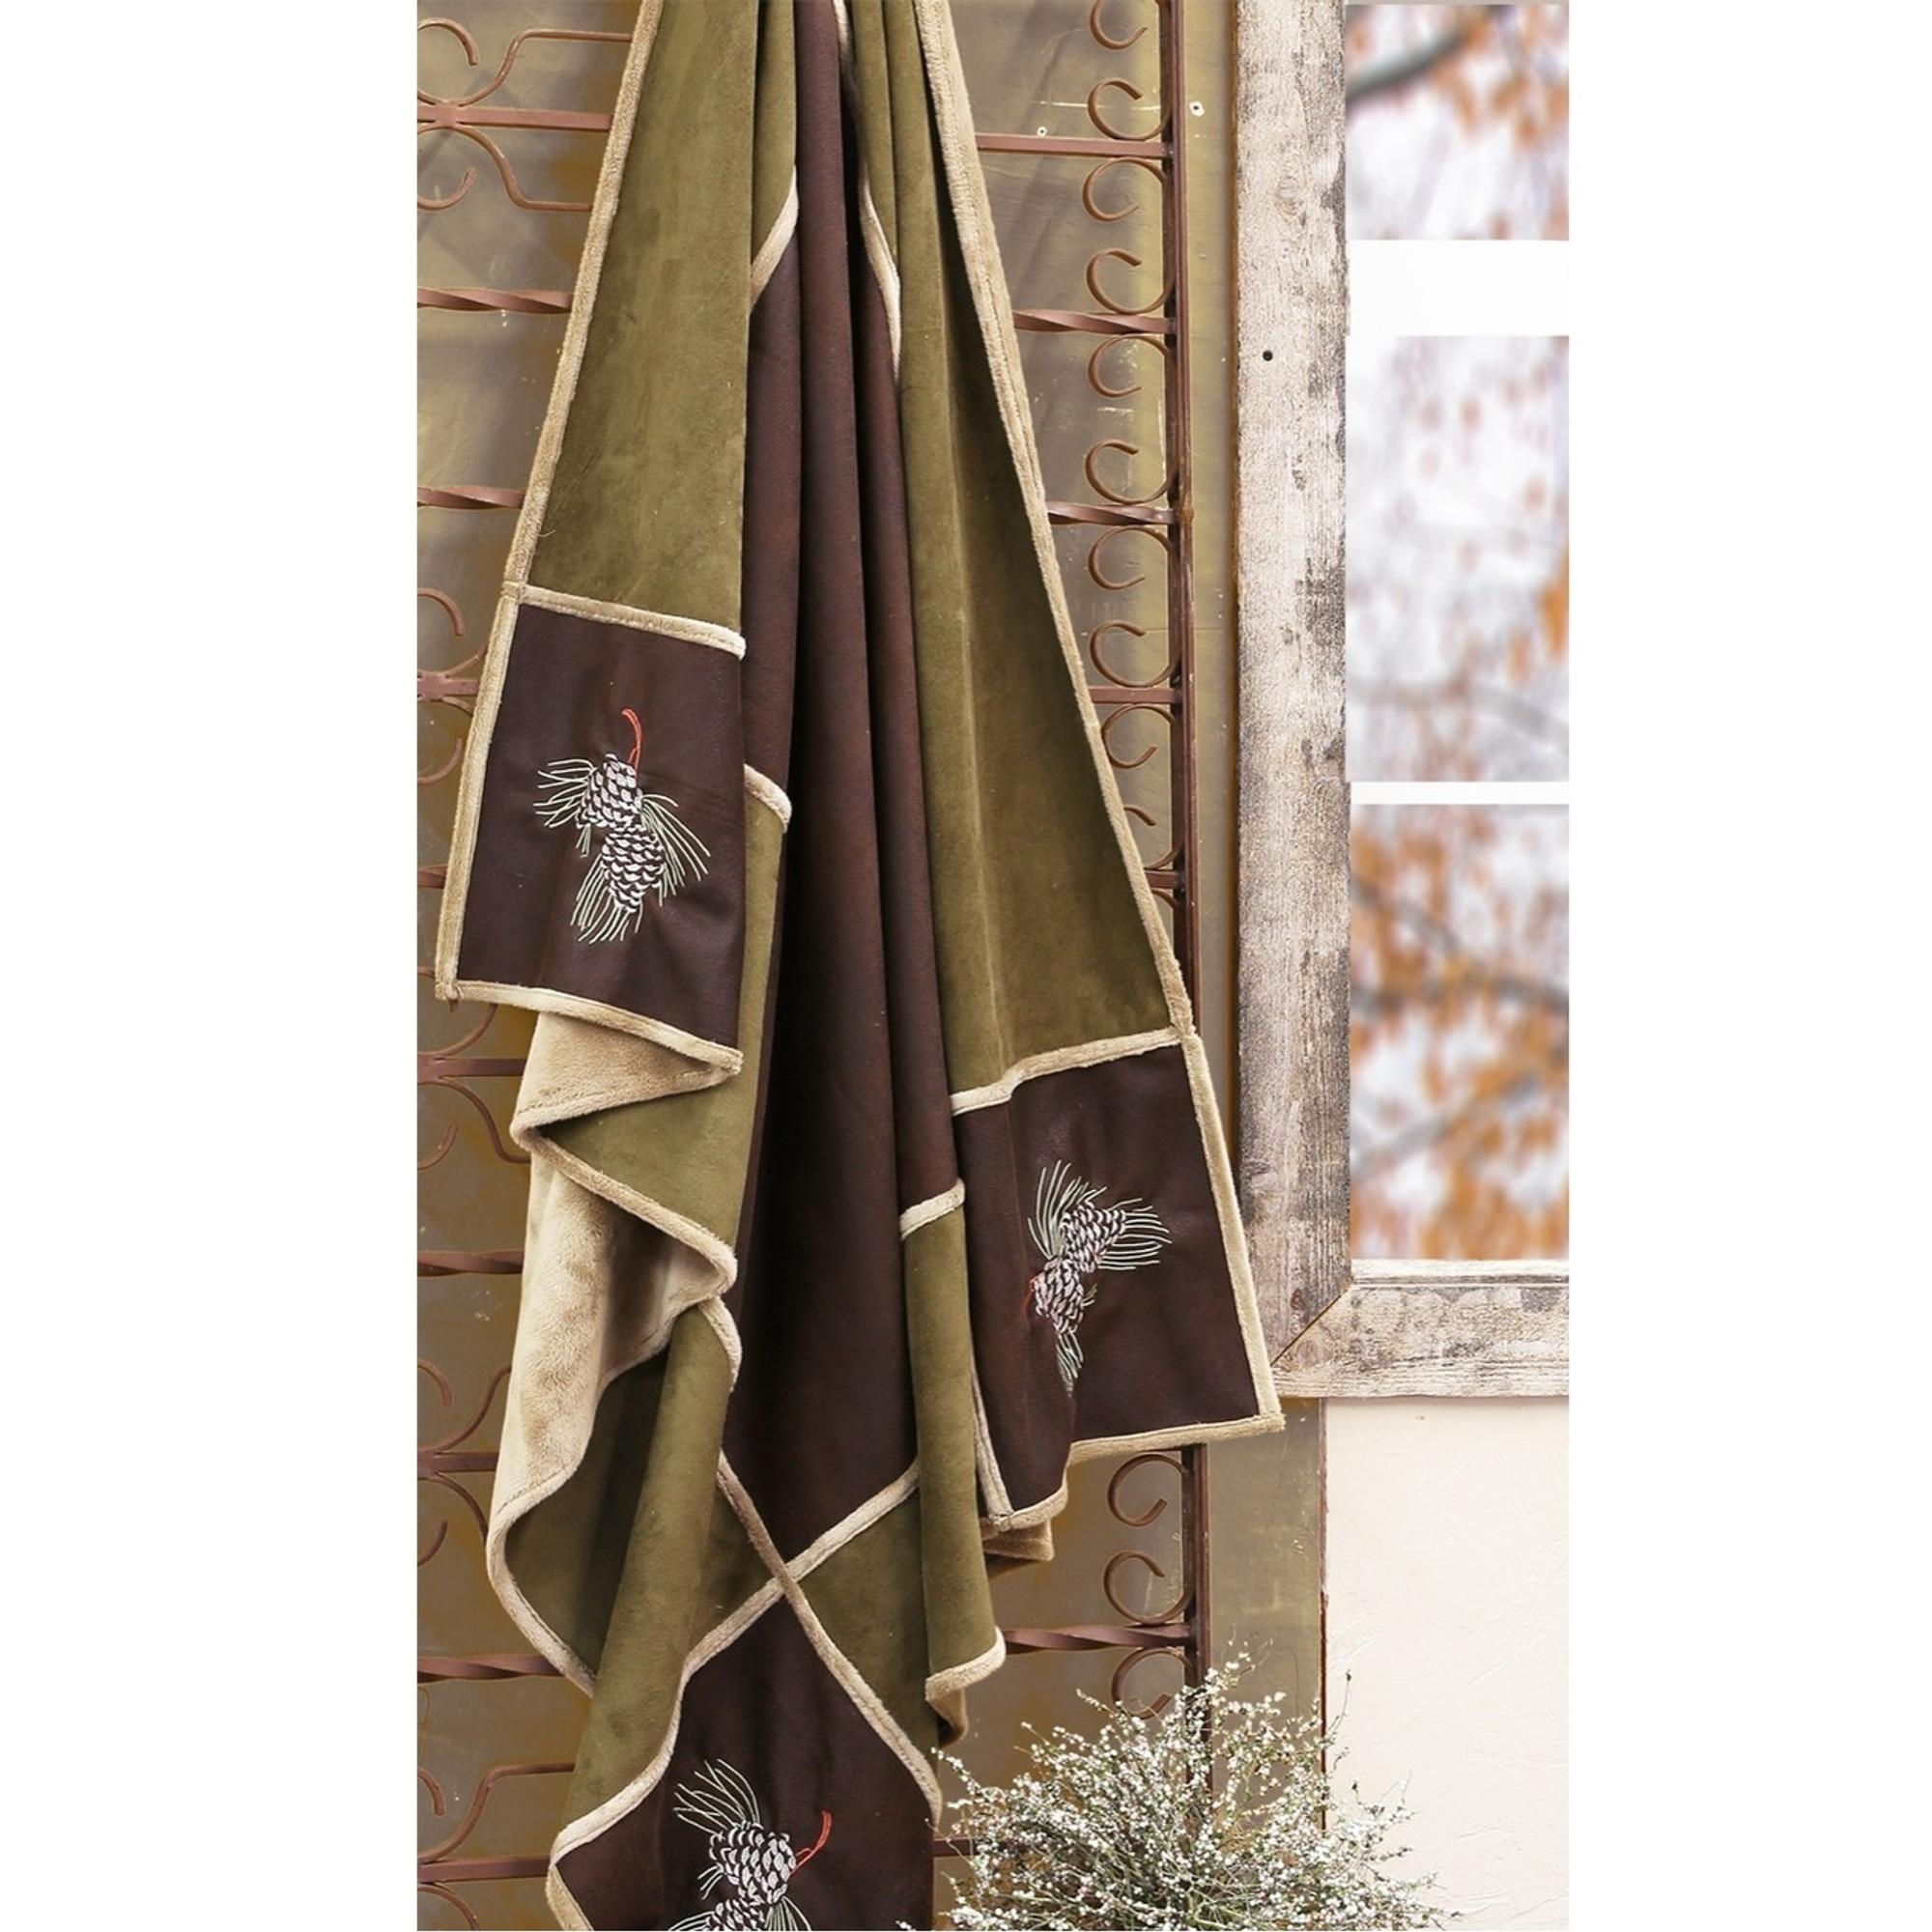 Pine Cone Grid Throw Pine Cone Grid Blanket Carstens